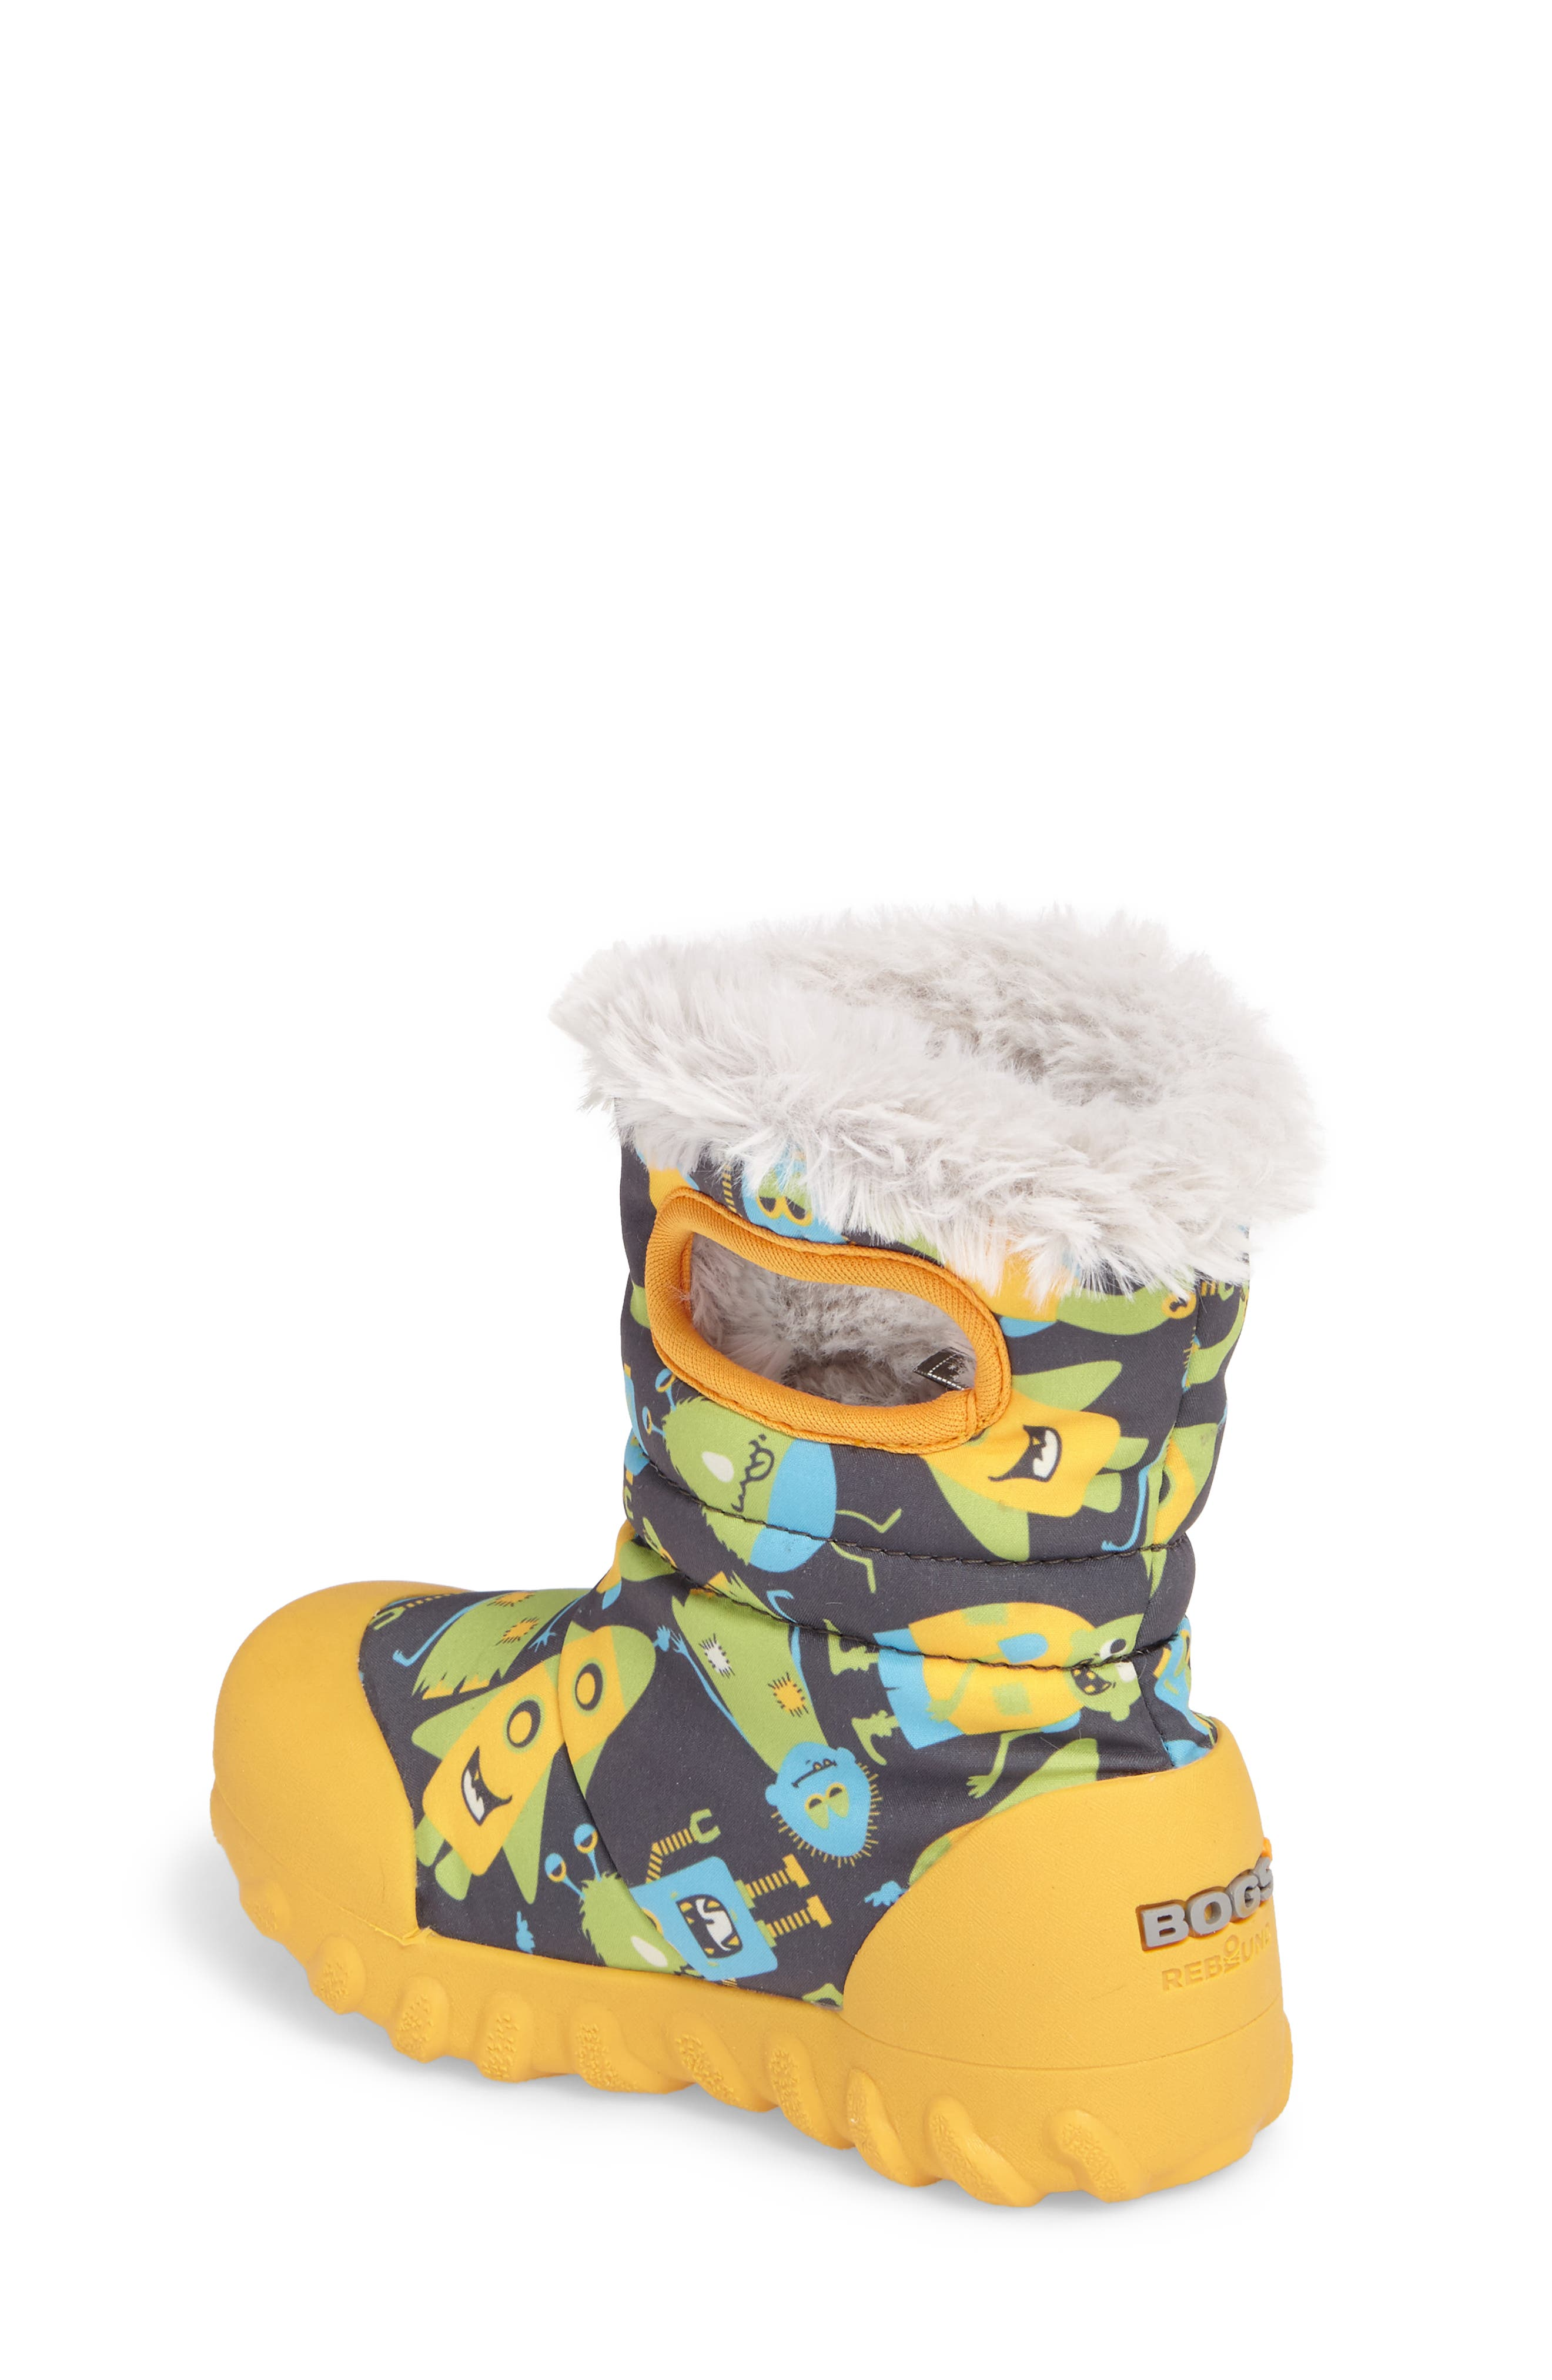 Alternate Image 2  - Bogs B-MOC Monsters Waterproof Insulated Faux Fur Winter Boot (Walker, Toddler, Little Kid & Big Kid)